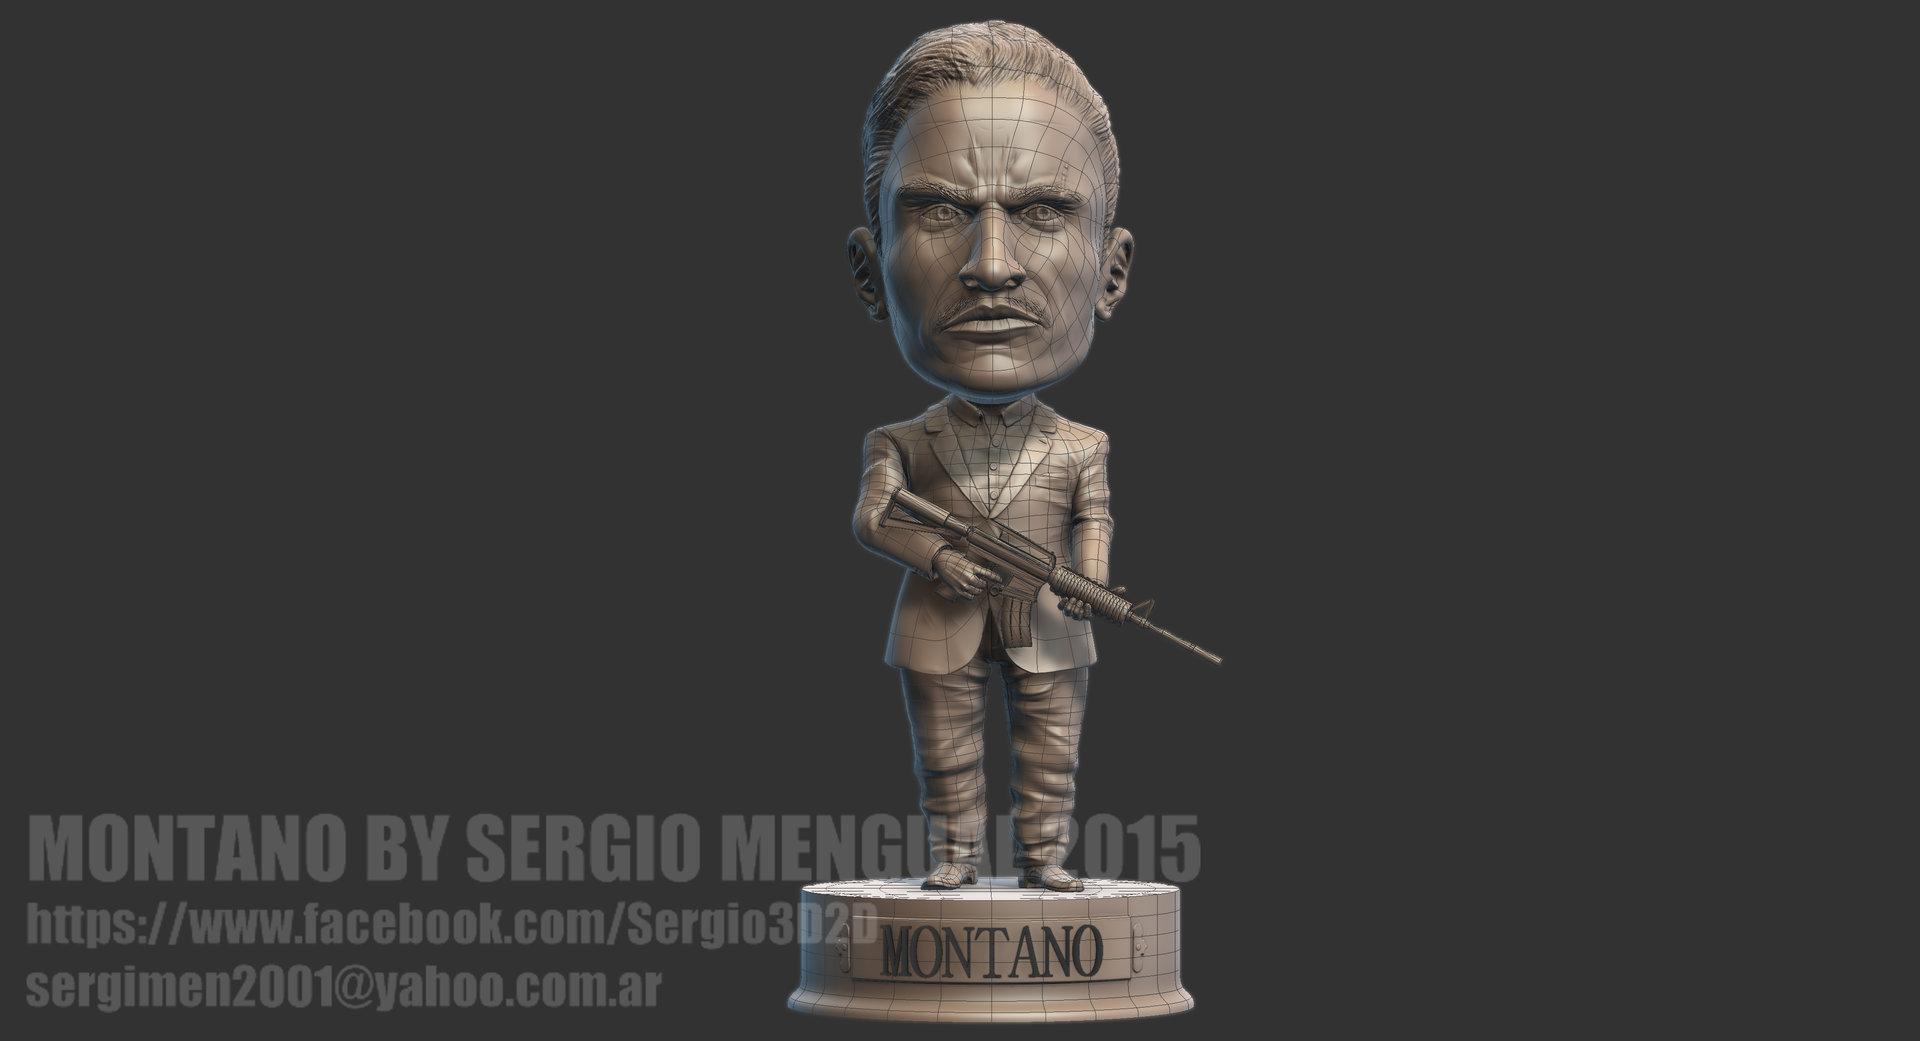 Sergio gabriel mengual montano final1